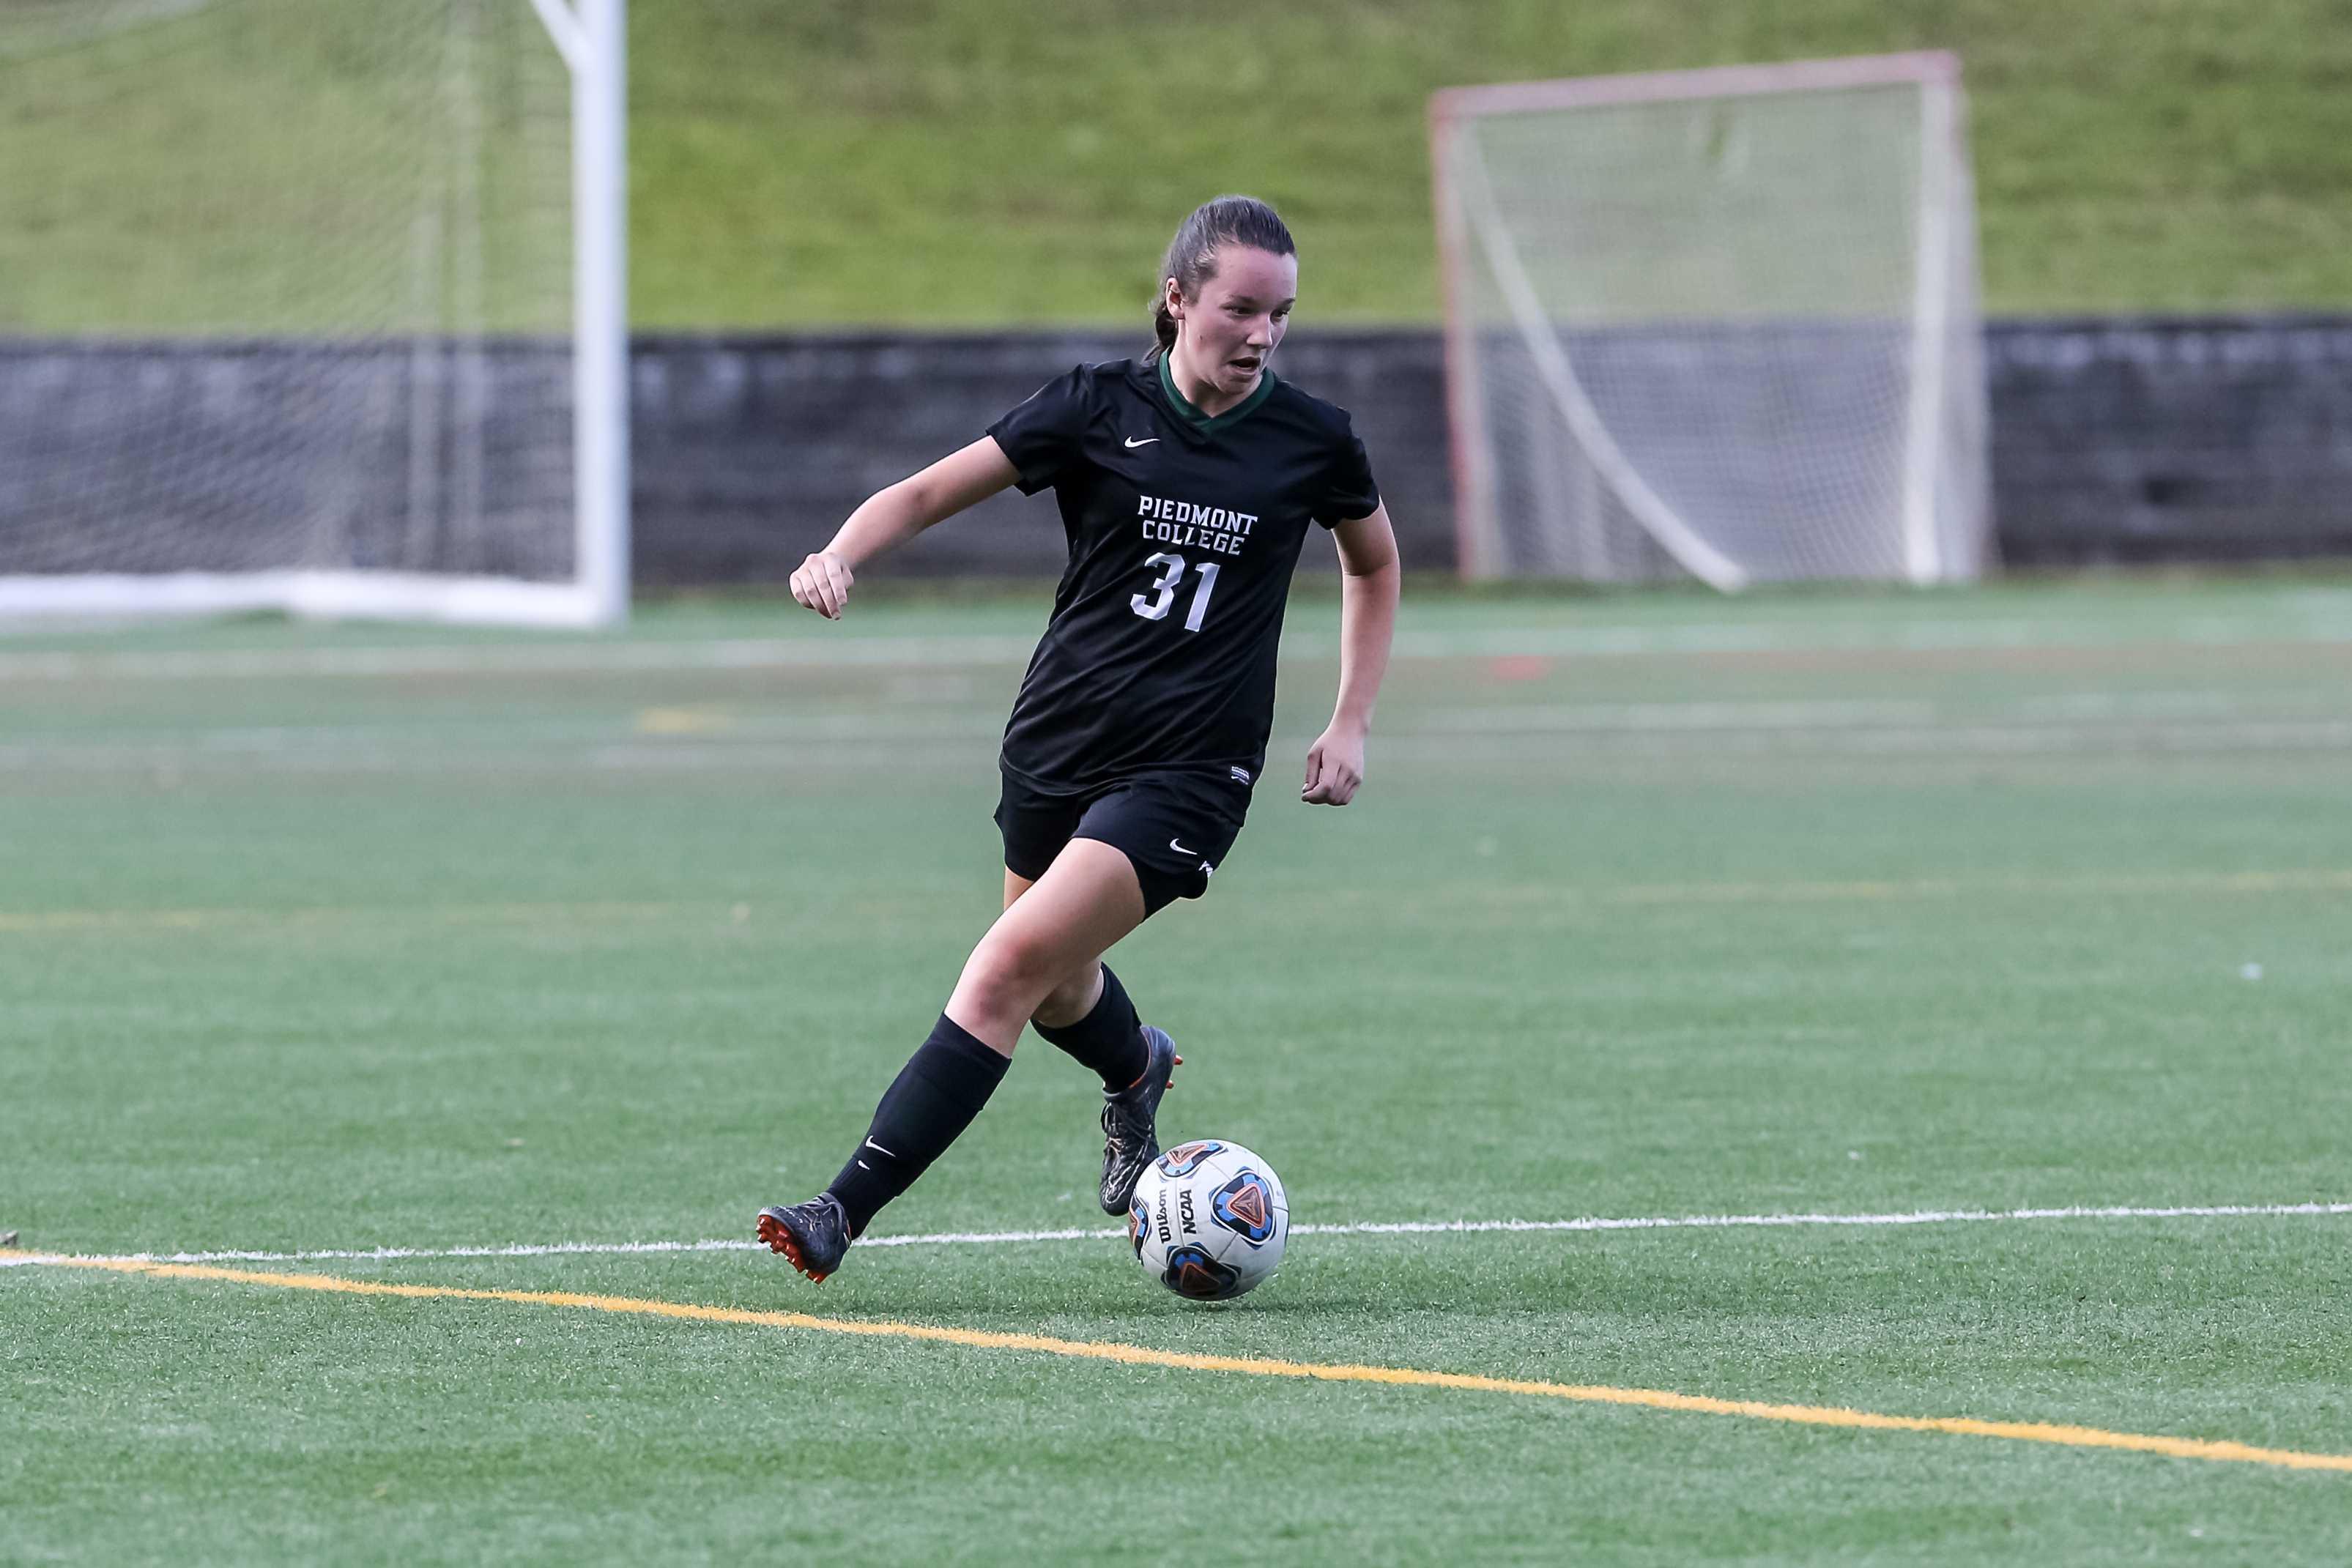 Piedmont College Women's Soccer vs Birmingham Southern. (Photo: Karl L. Moore)